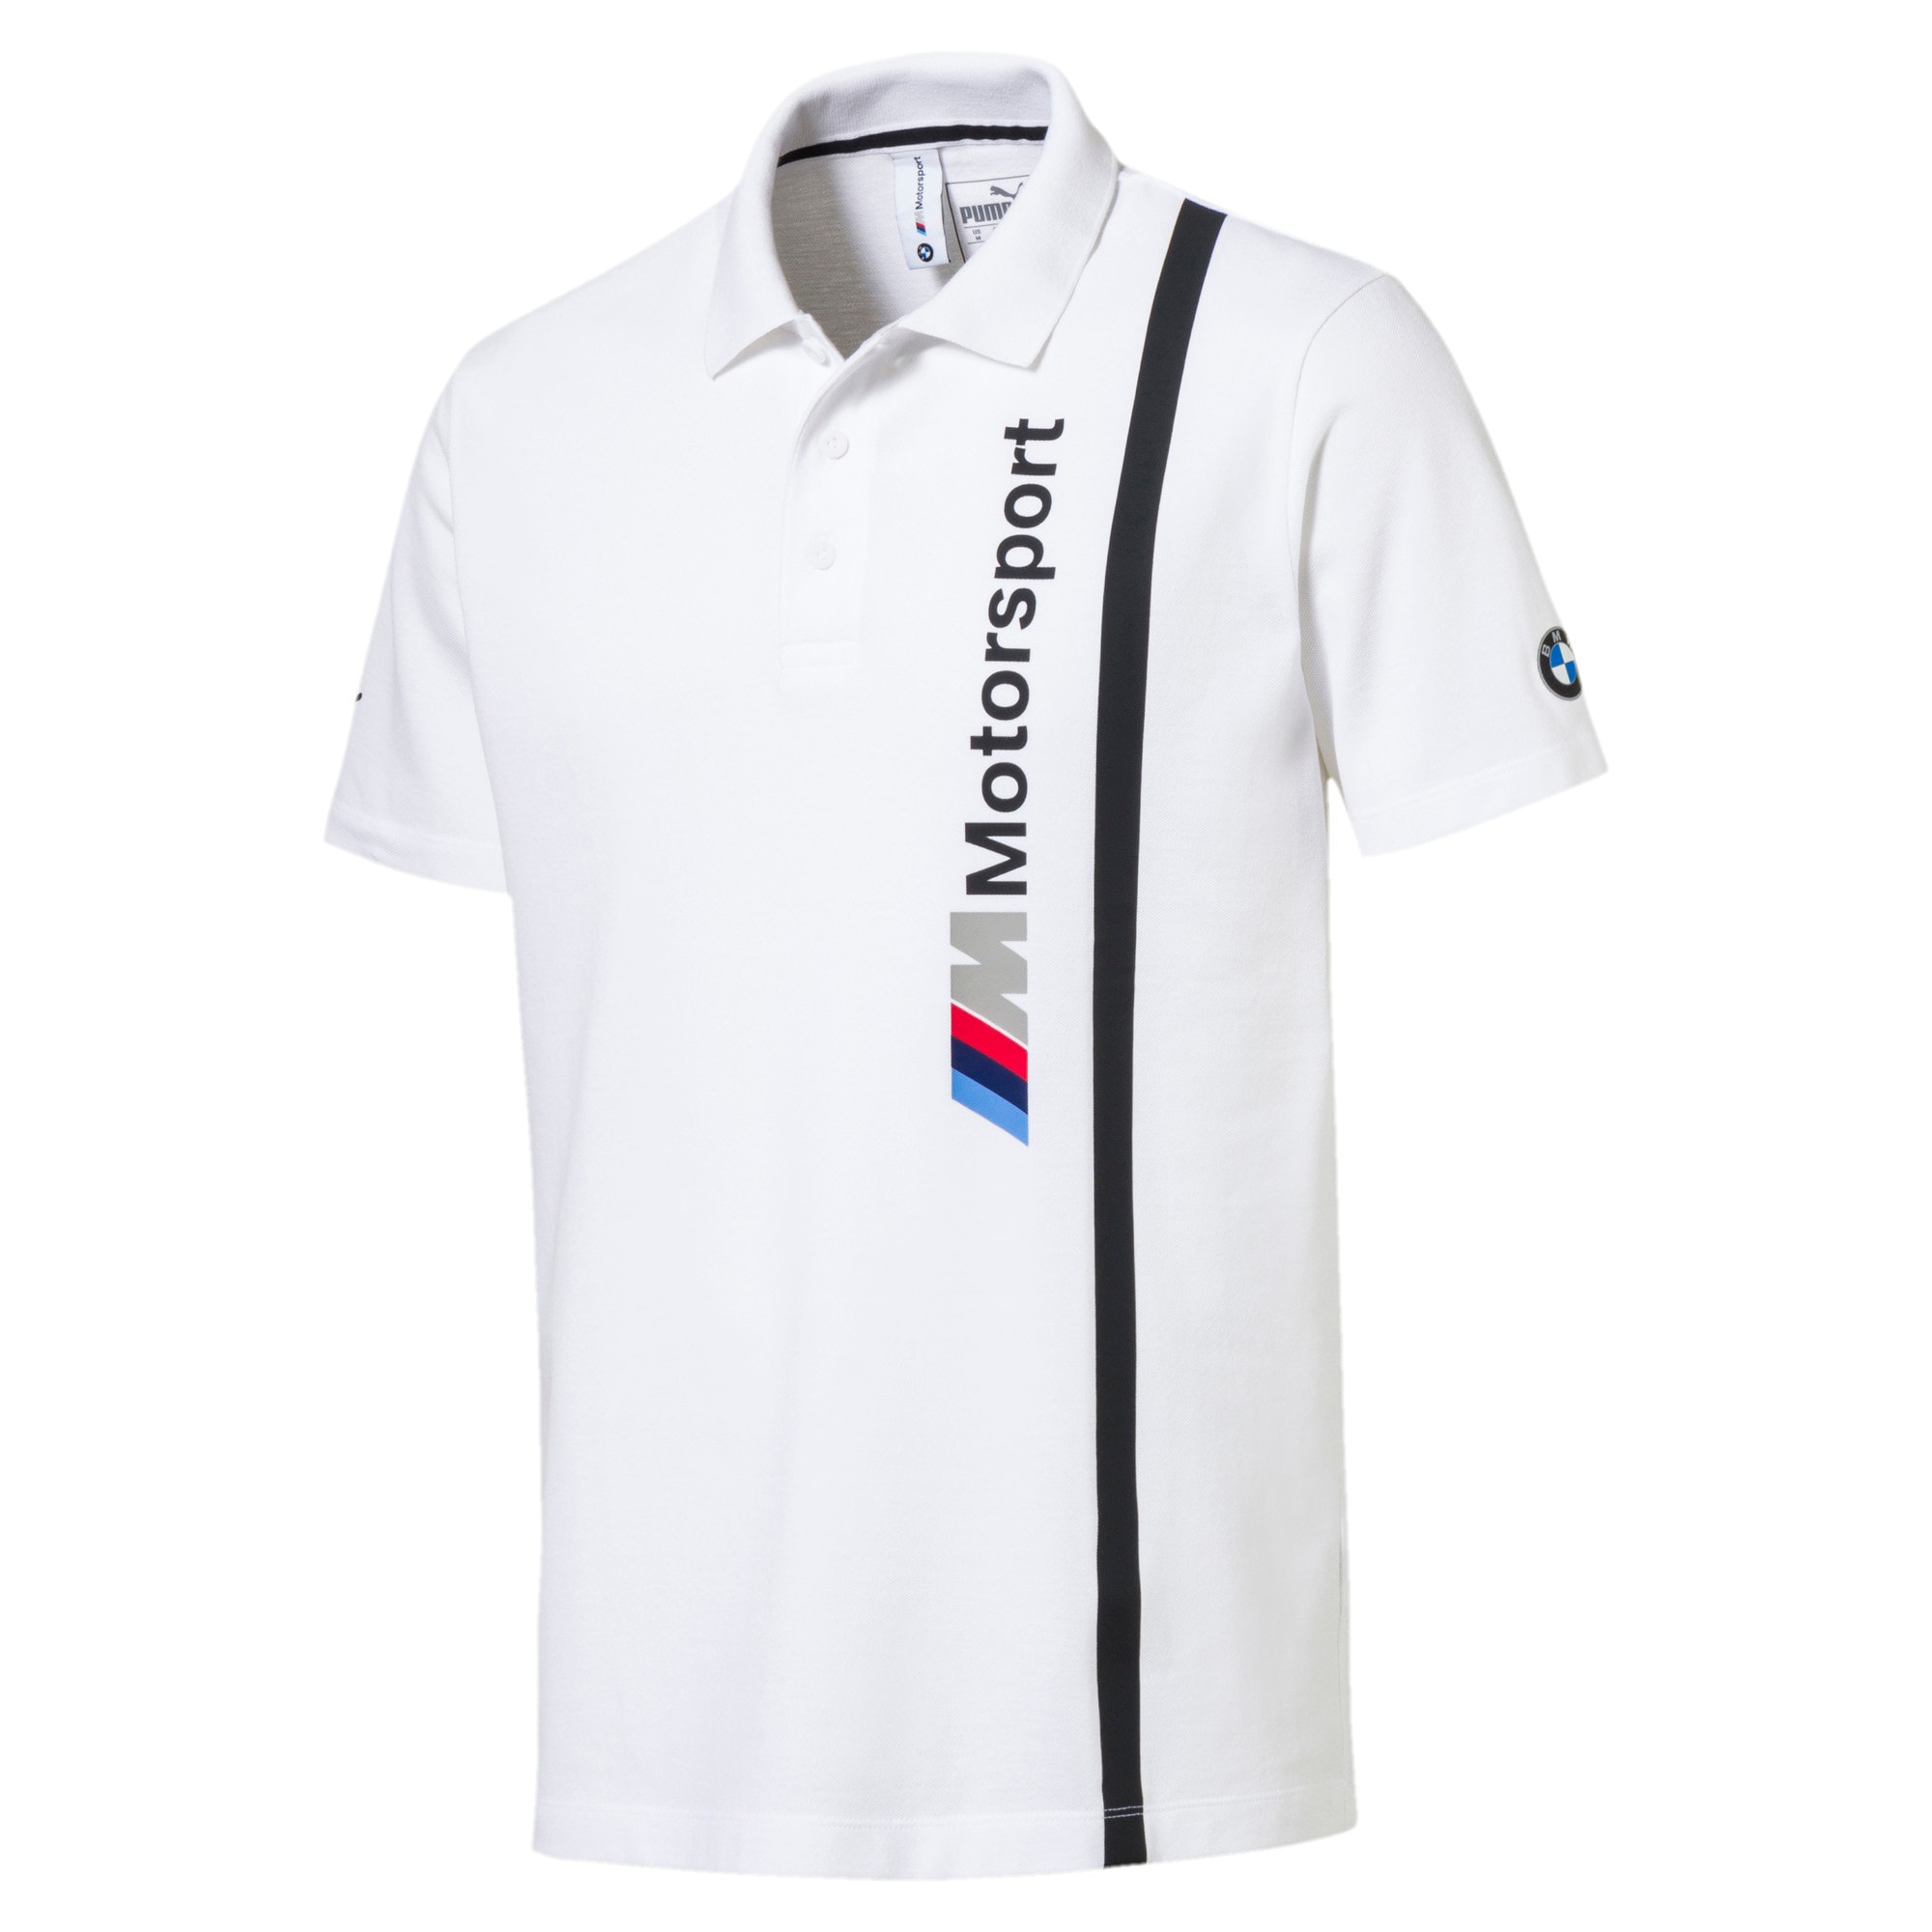 Thumbnail 3 of BMW M Motorsport Men's Polo, Puma White, medium-IND